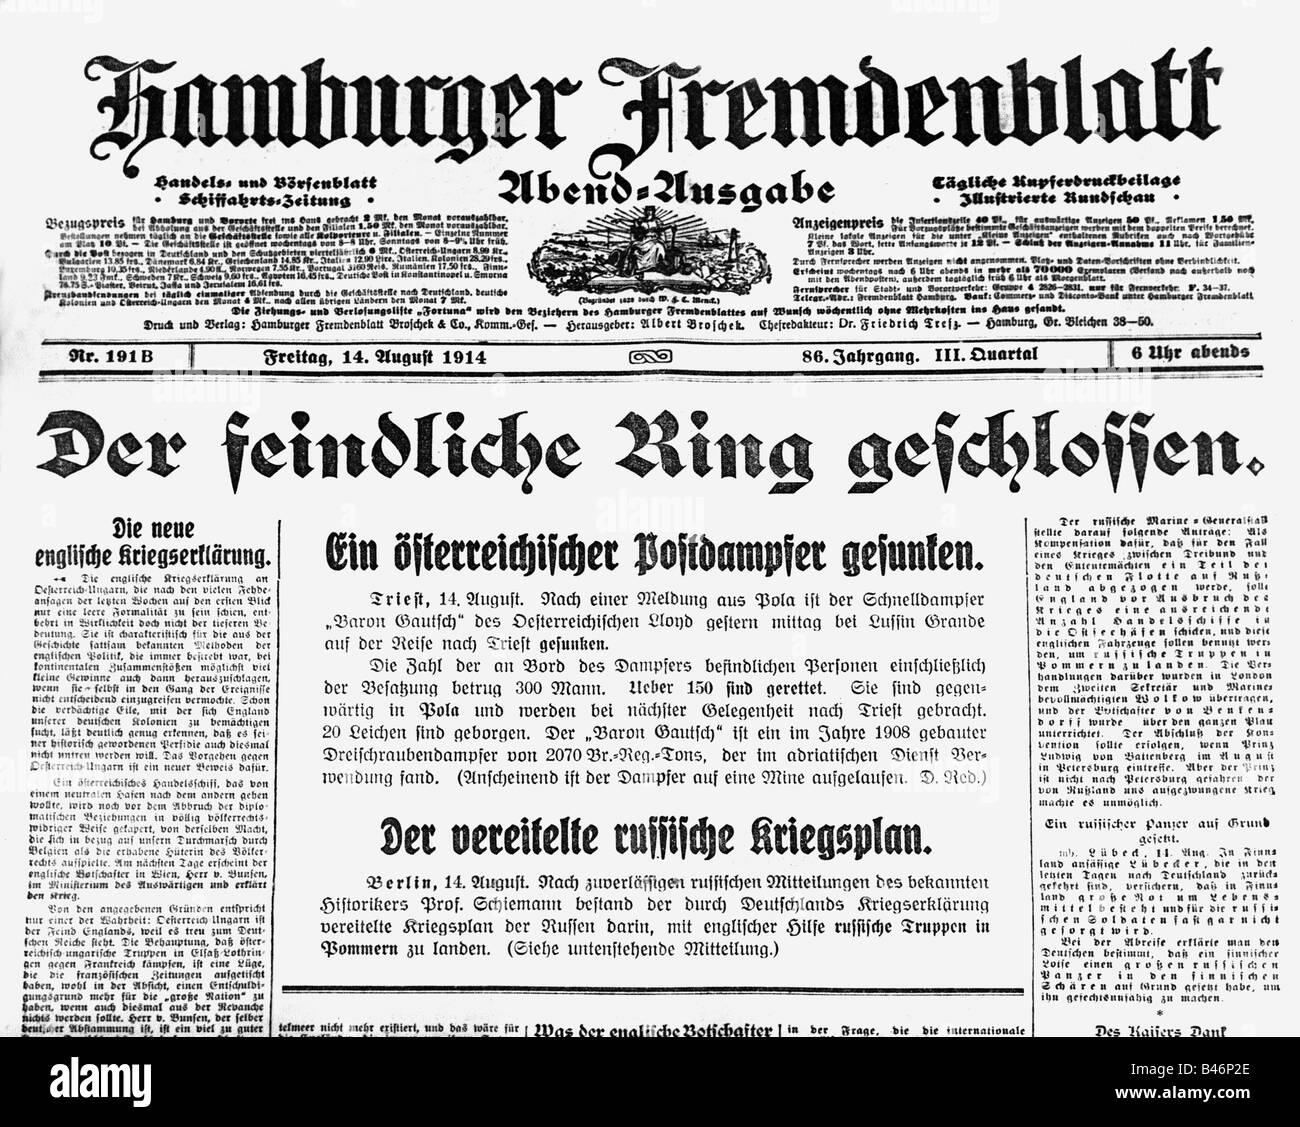 press / media, journals / magazines, Hamburger Fremdenblatt, evening edition, volume 86, No. 191 B, 14.8.1914, report - Stock Image